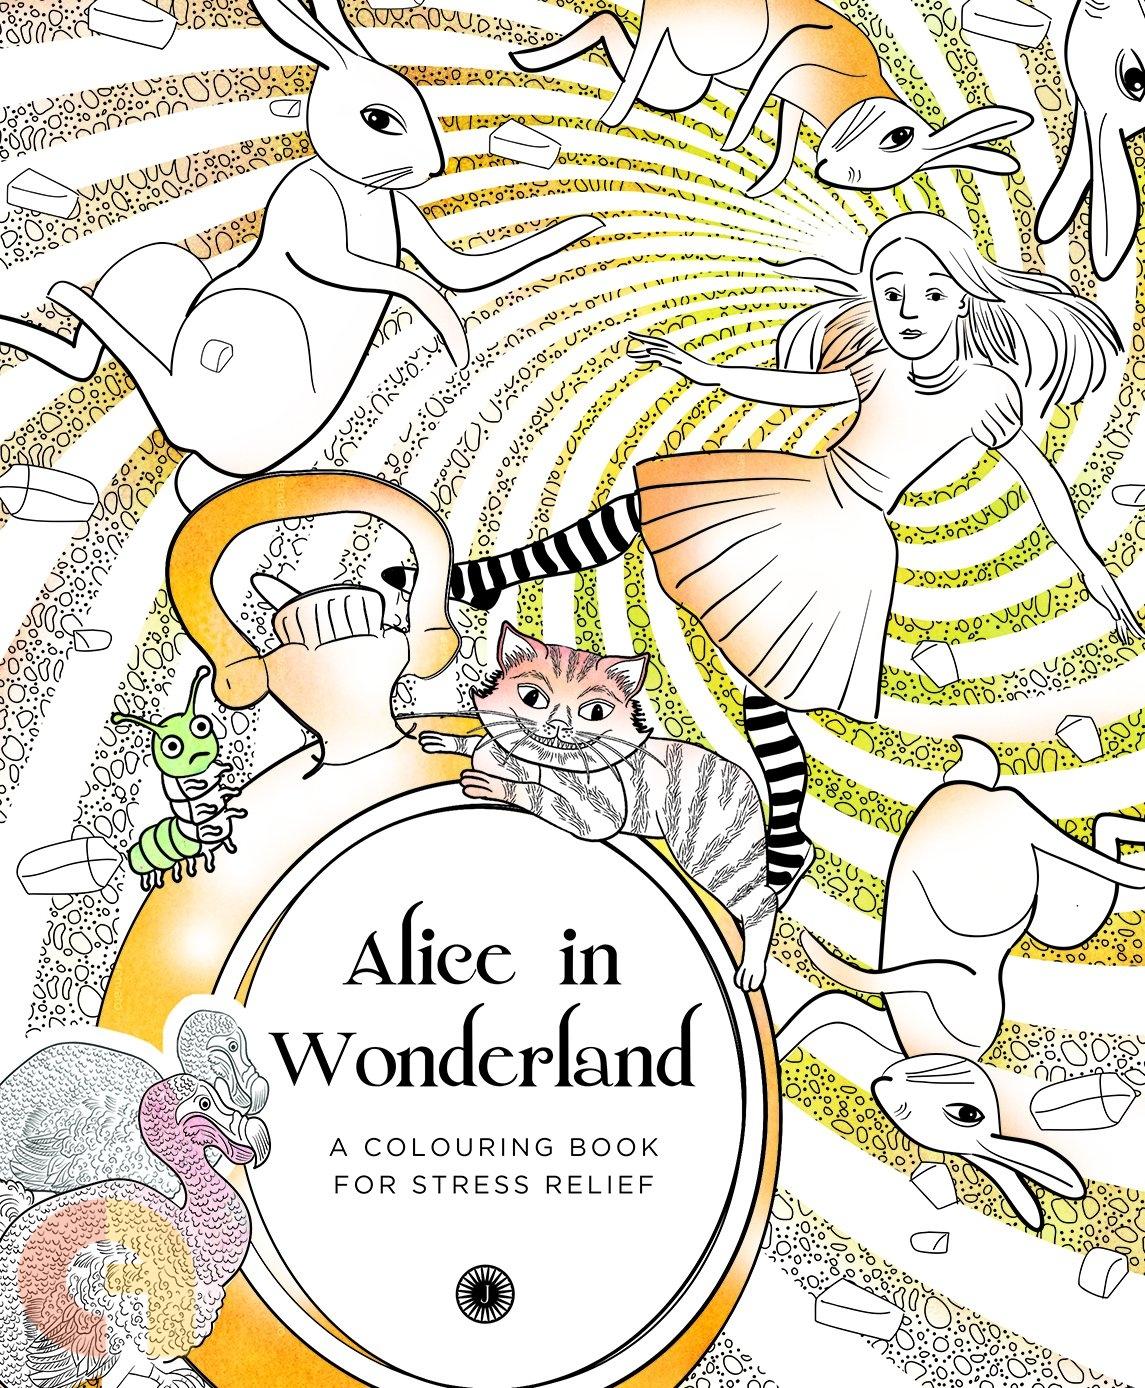 Alice in Wonderland (Jaico)